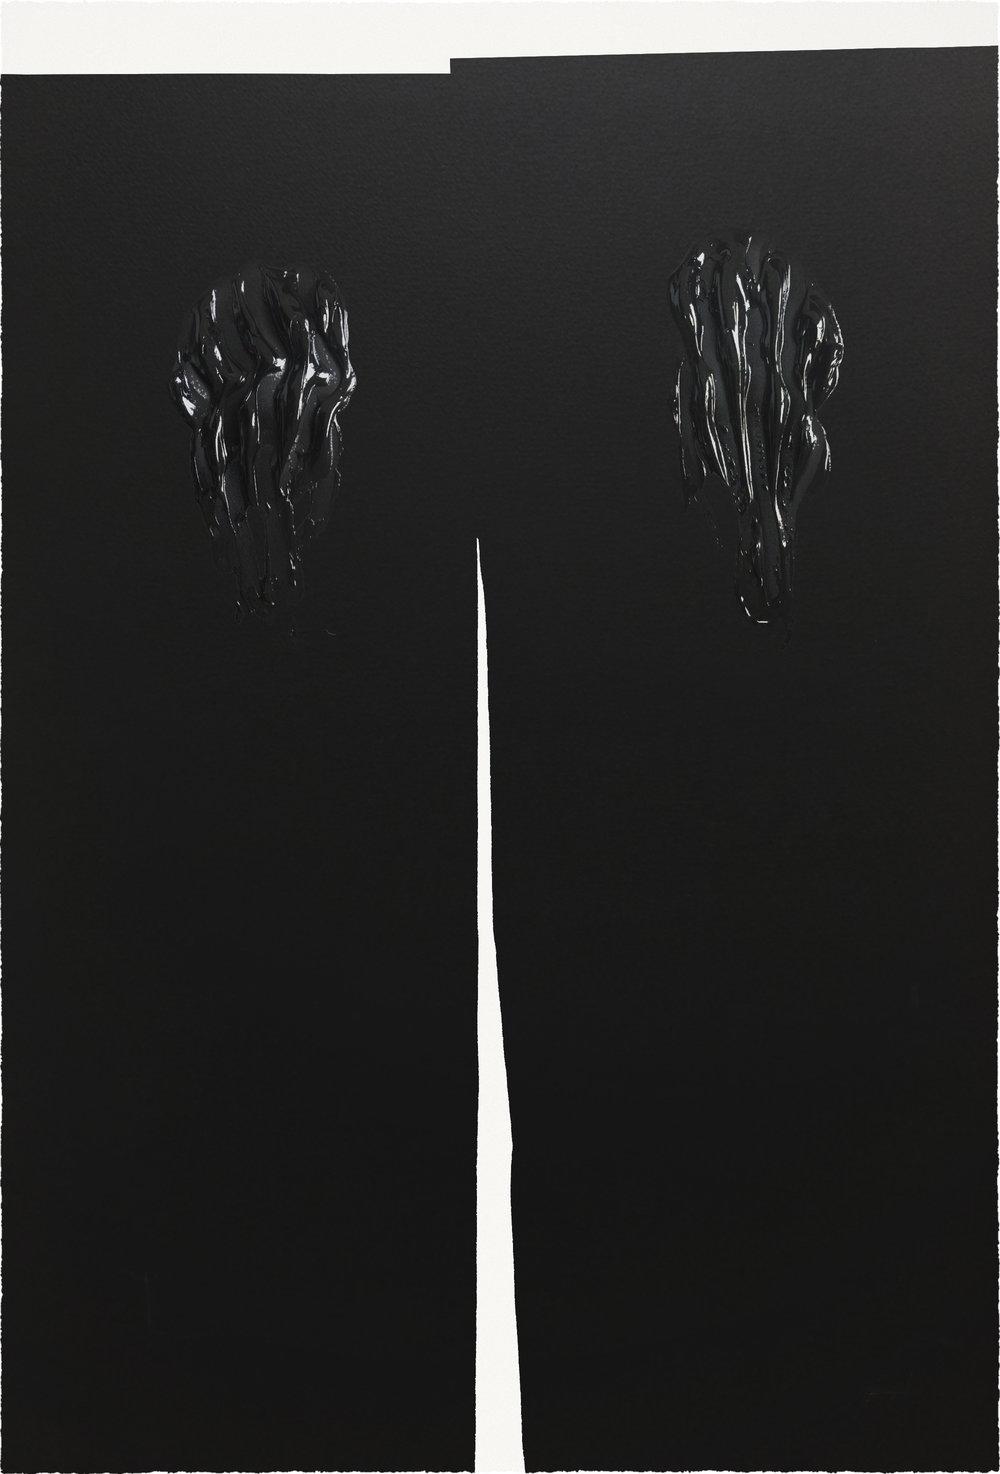 Two Hands, Two Lines, Diego Berjon